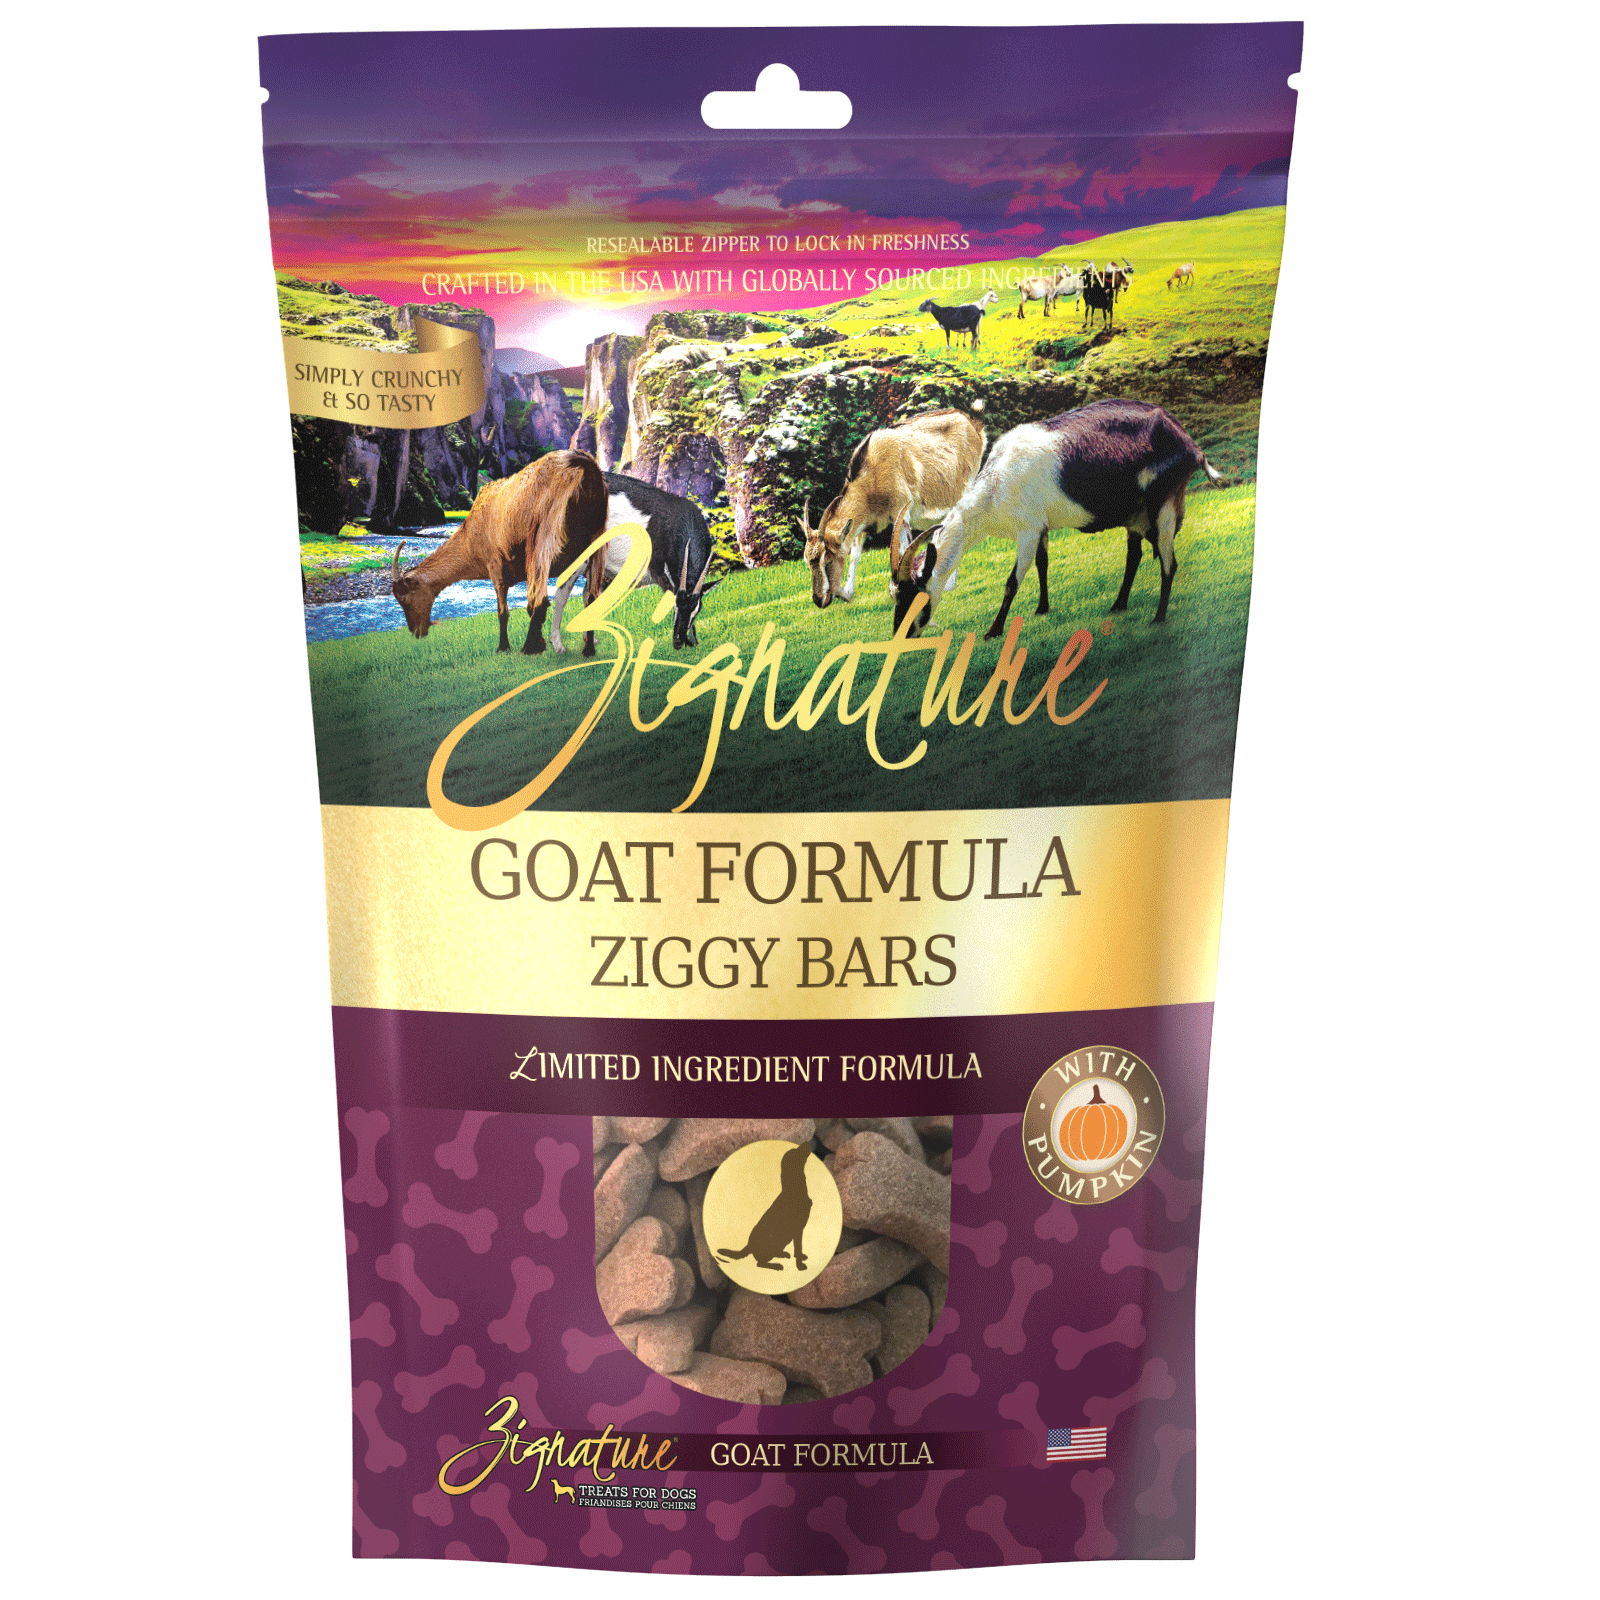 Zignature Goat Formula Biscuit Treats for Dogs